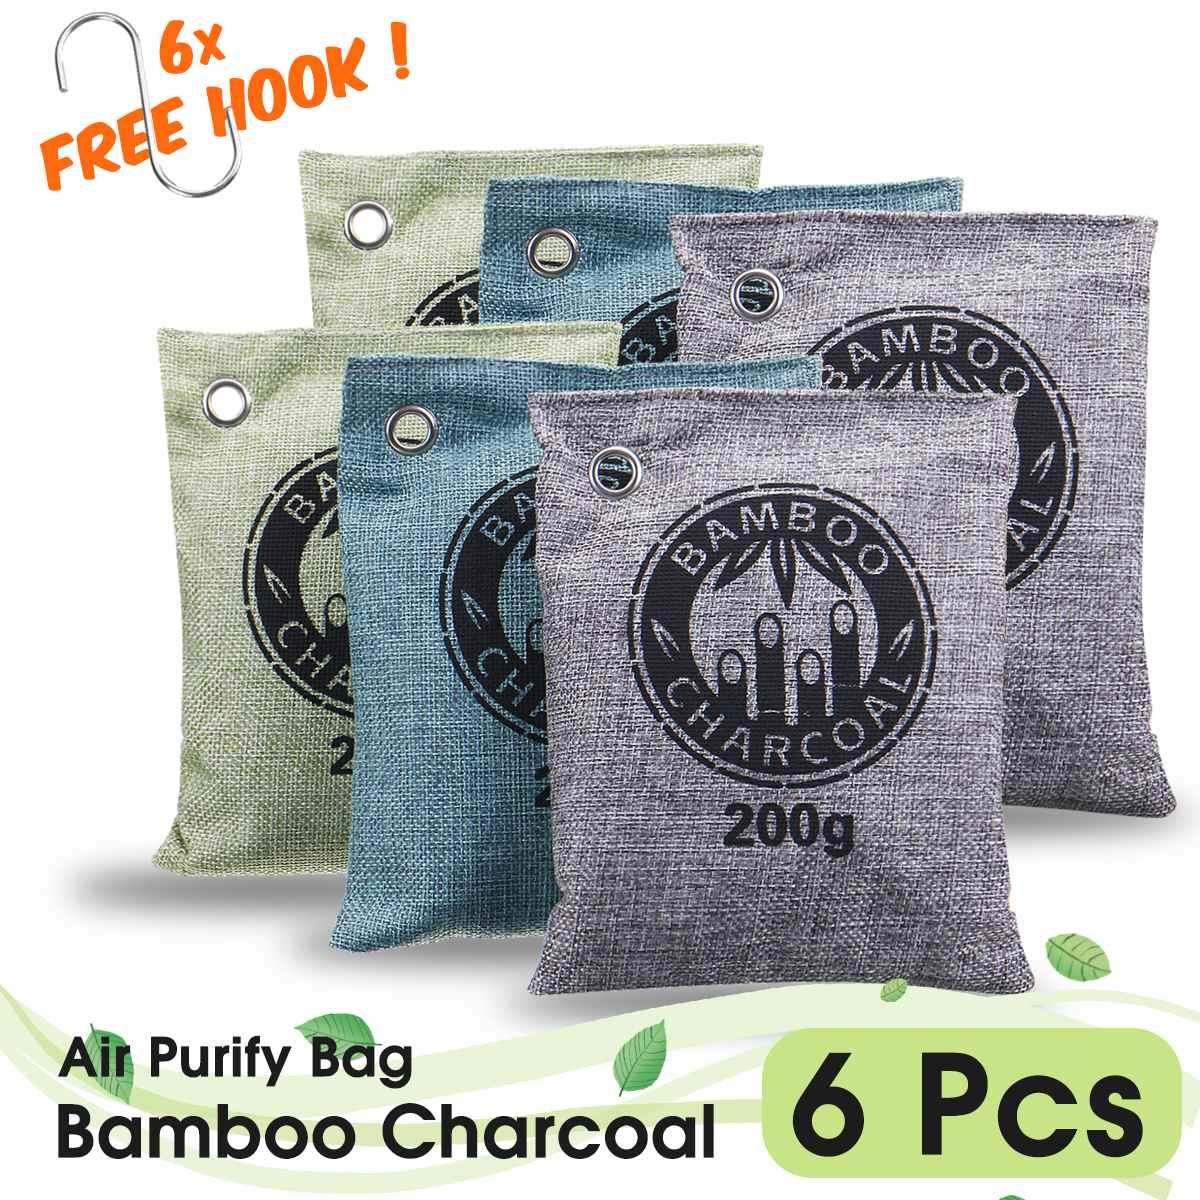 3/4/5/6/8 Bags 200G Air Purifying Bags Nature Fresh Charcoal Bamboo Air Purifying Bag Mold Odor Purifier Bamboo Charcoal